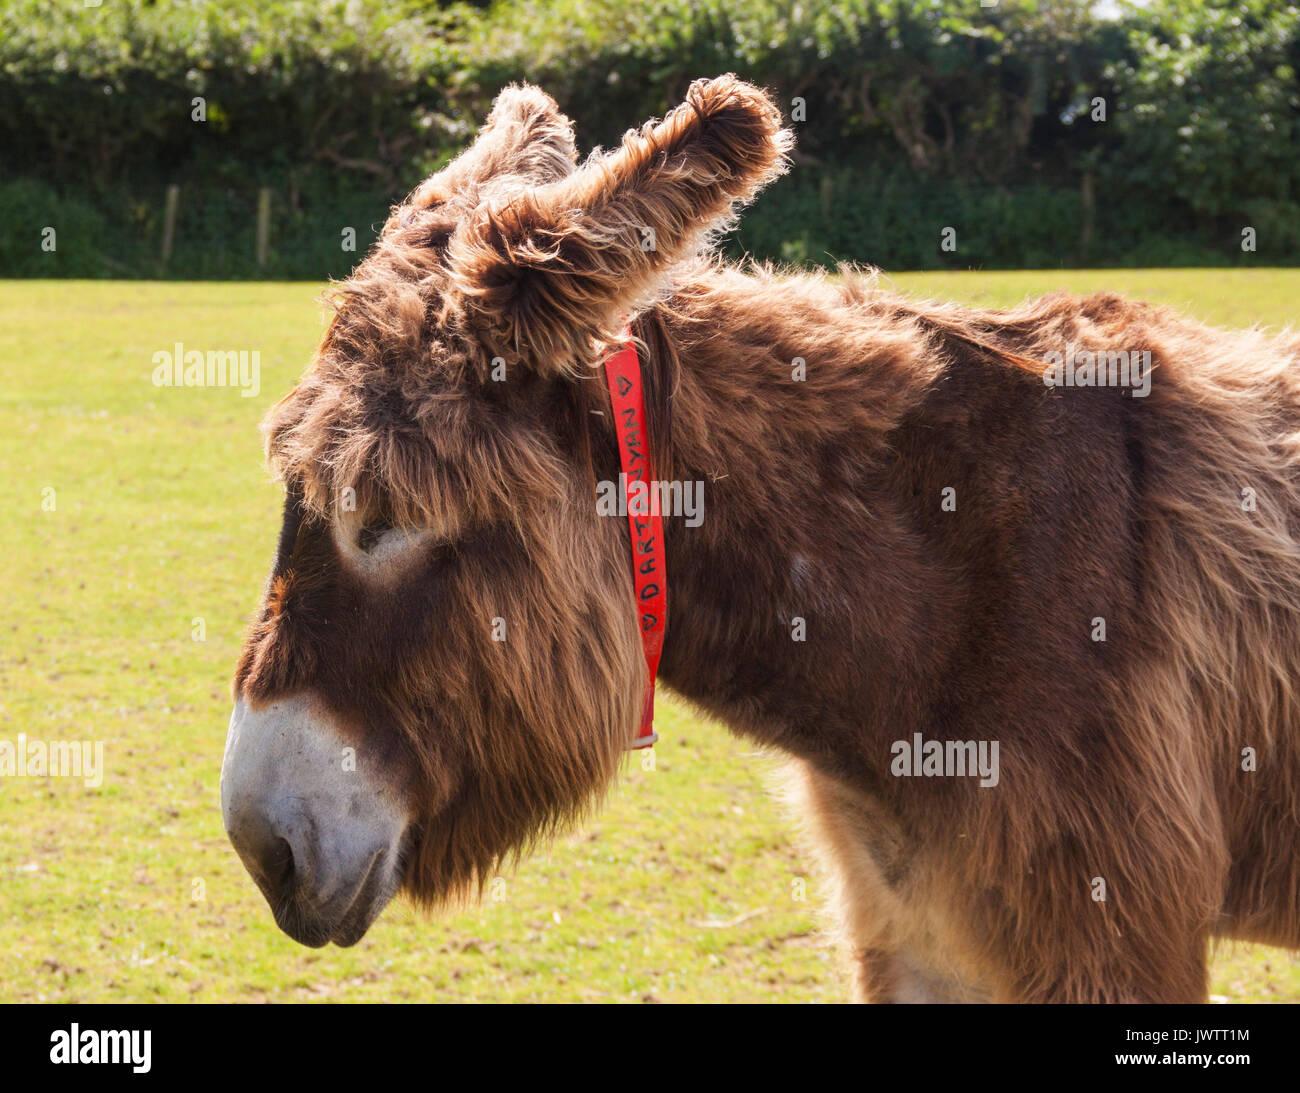 Dartanyan, a long haired donkey at Sidmouth donkey sanctuary - Stock Image